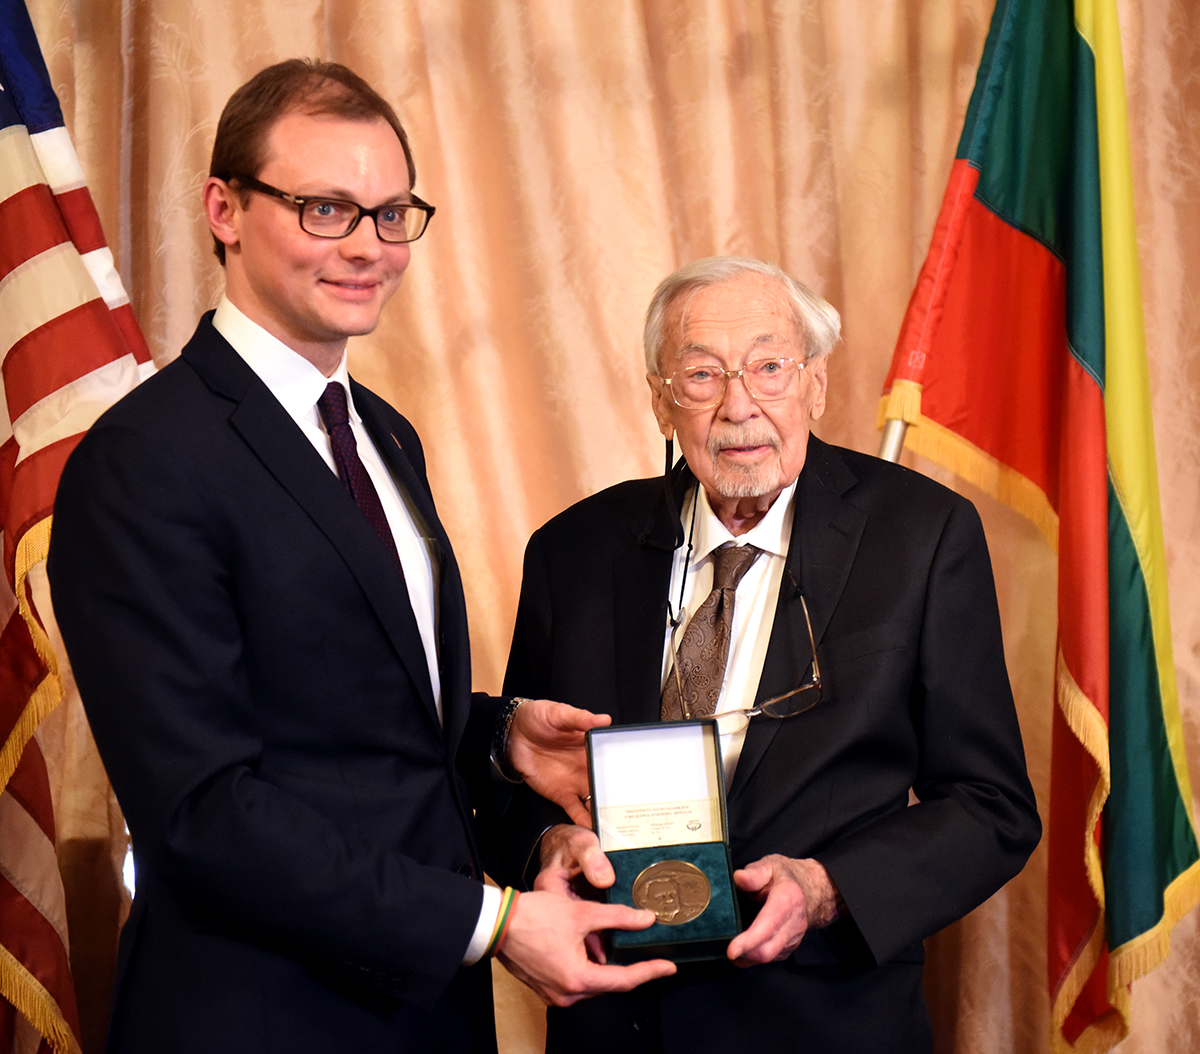 M. Bekešius perdavė S. Balzekui Jr. Lietuvos prezidento Valdo Adamkaus dovaną muziejui – medalį, kuris praturtins jo fondus.